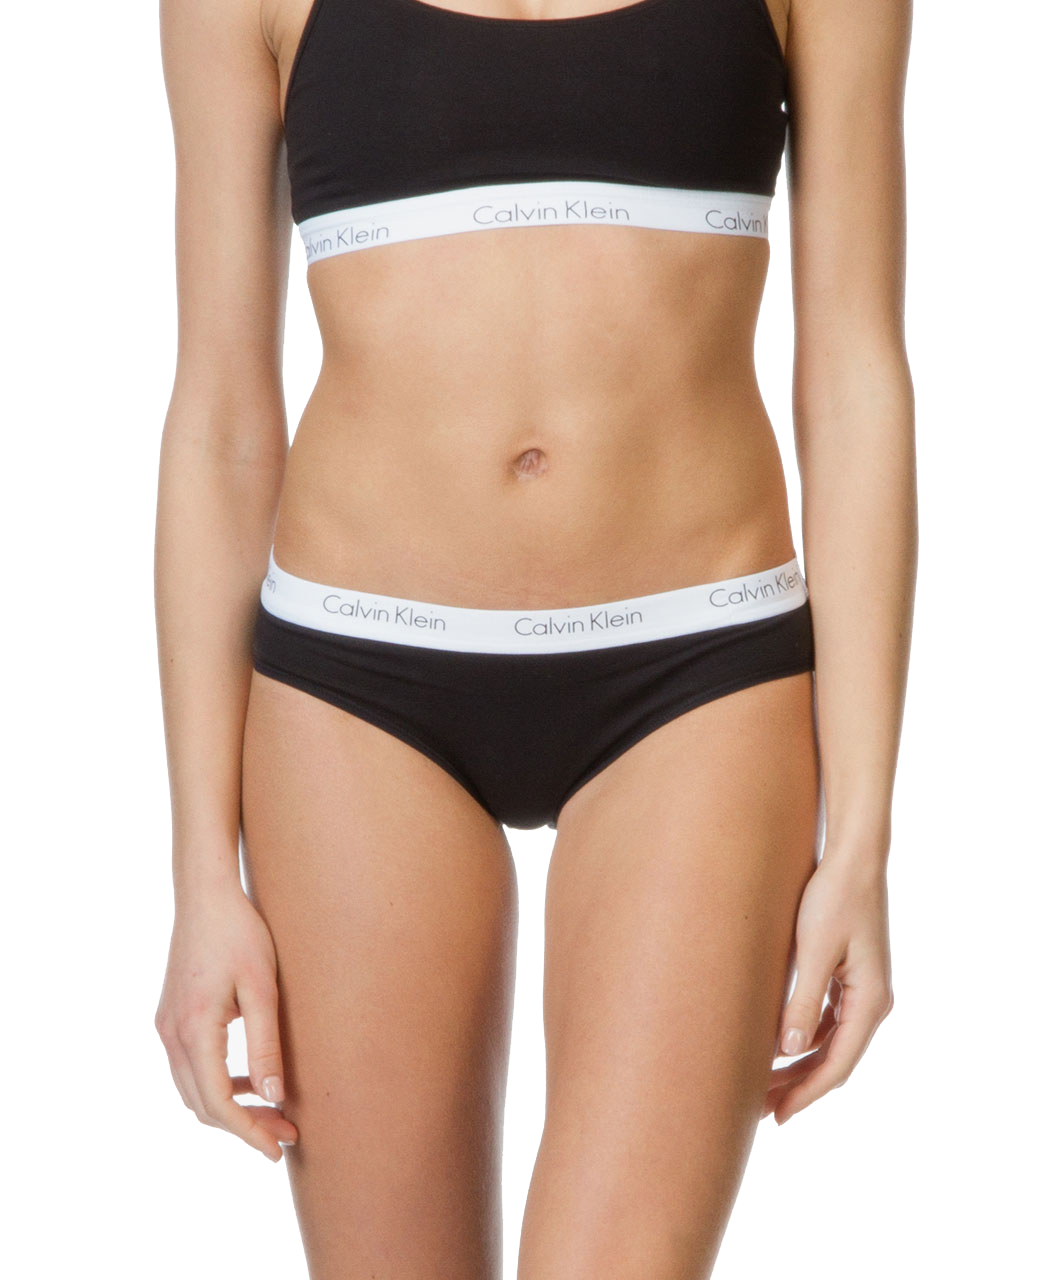 96400c07ed Calvin Klein černé kalhotky Bikini s bílou gumou - Spodní Prádlo ...